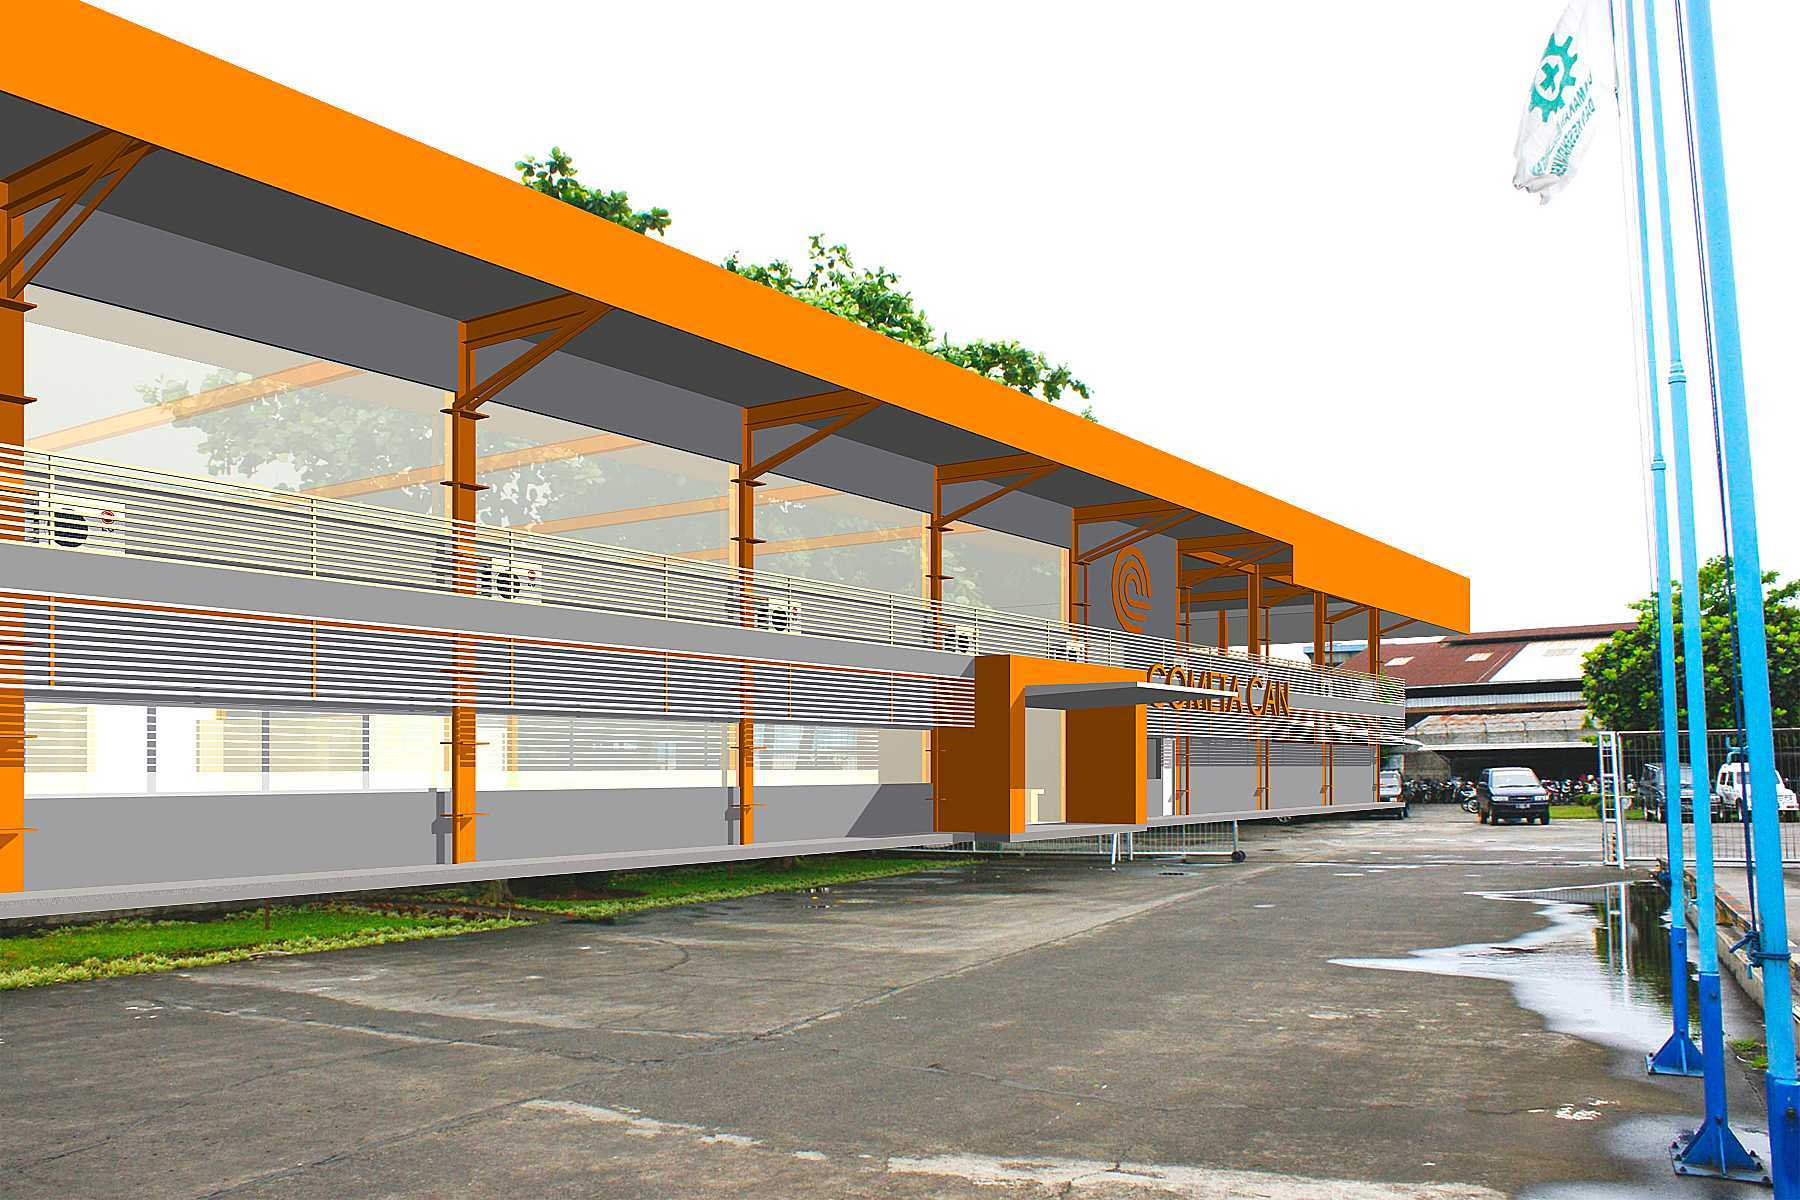 Pt.  Atelier Una Indonesia Cometa Office  Bitung, Kota Bitung, Sulawesi Utara, Indonesia Bitung, Kota Bitung, Sulawesi Utara, Indonesia Pt-Atelier-Una-Indonesia-Cometa-Office-  57928